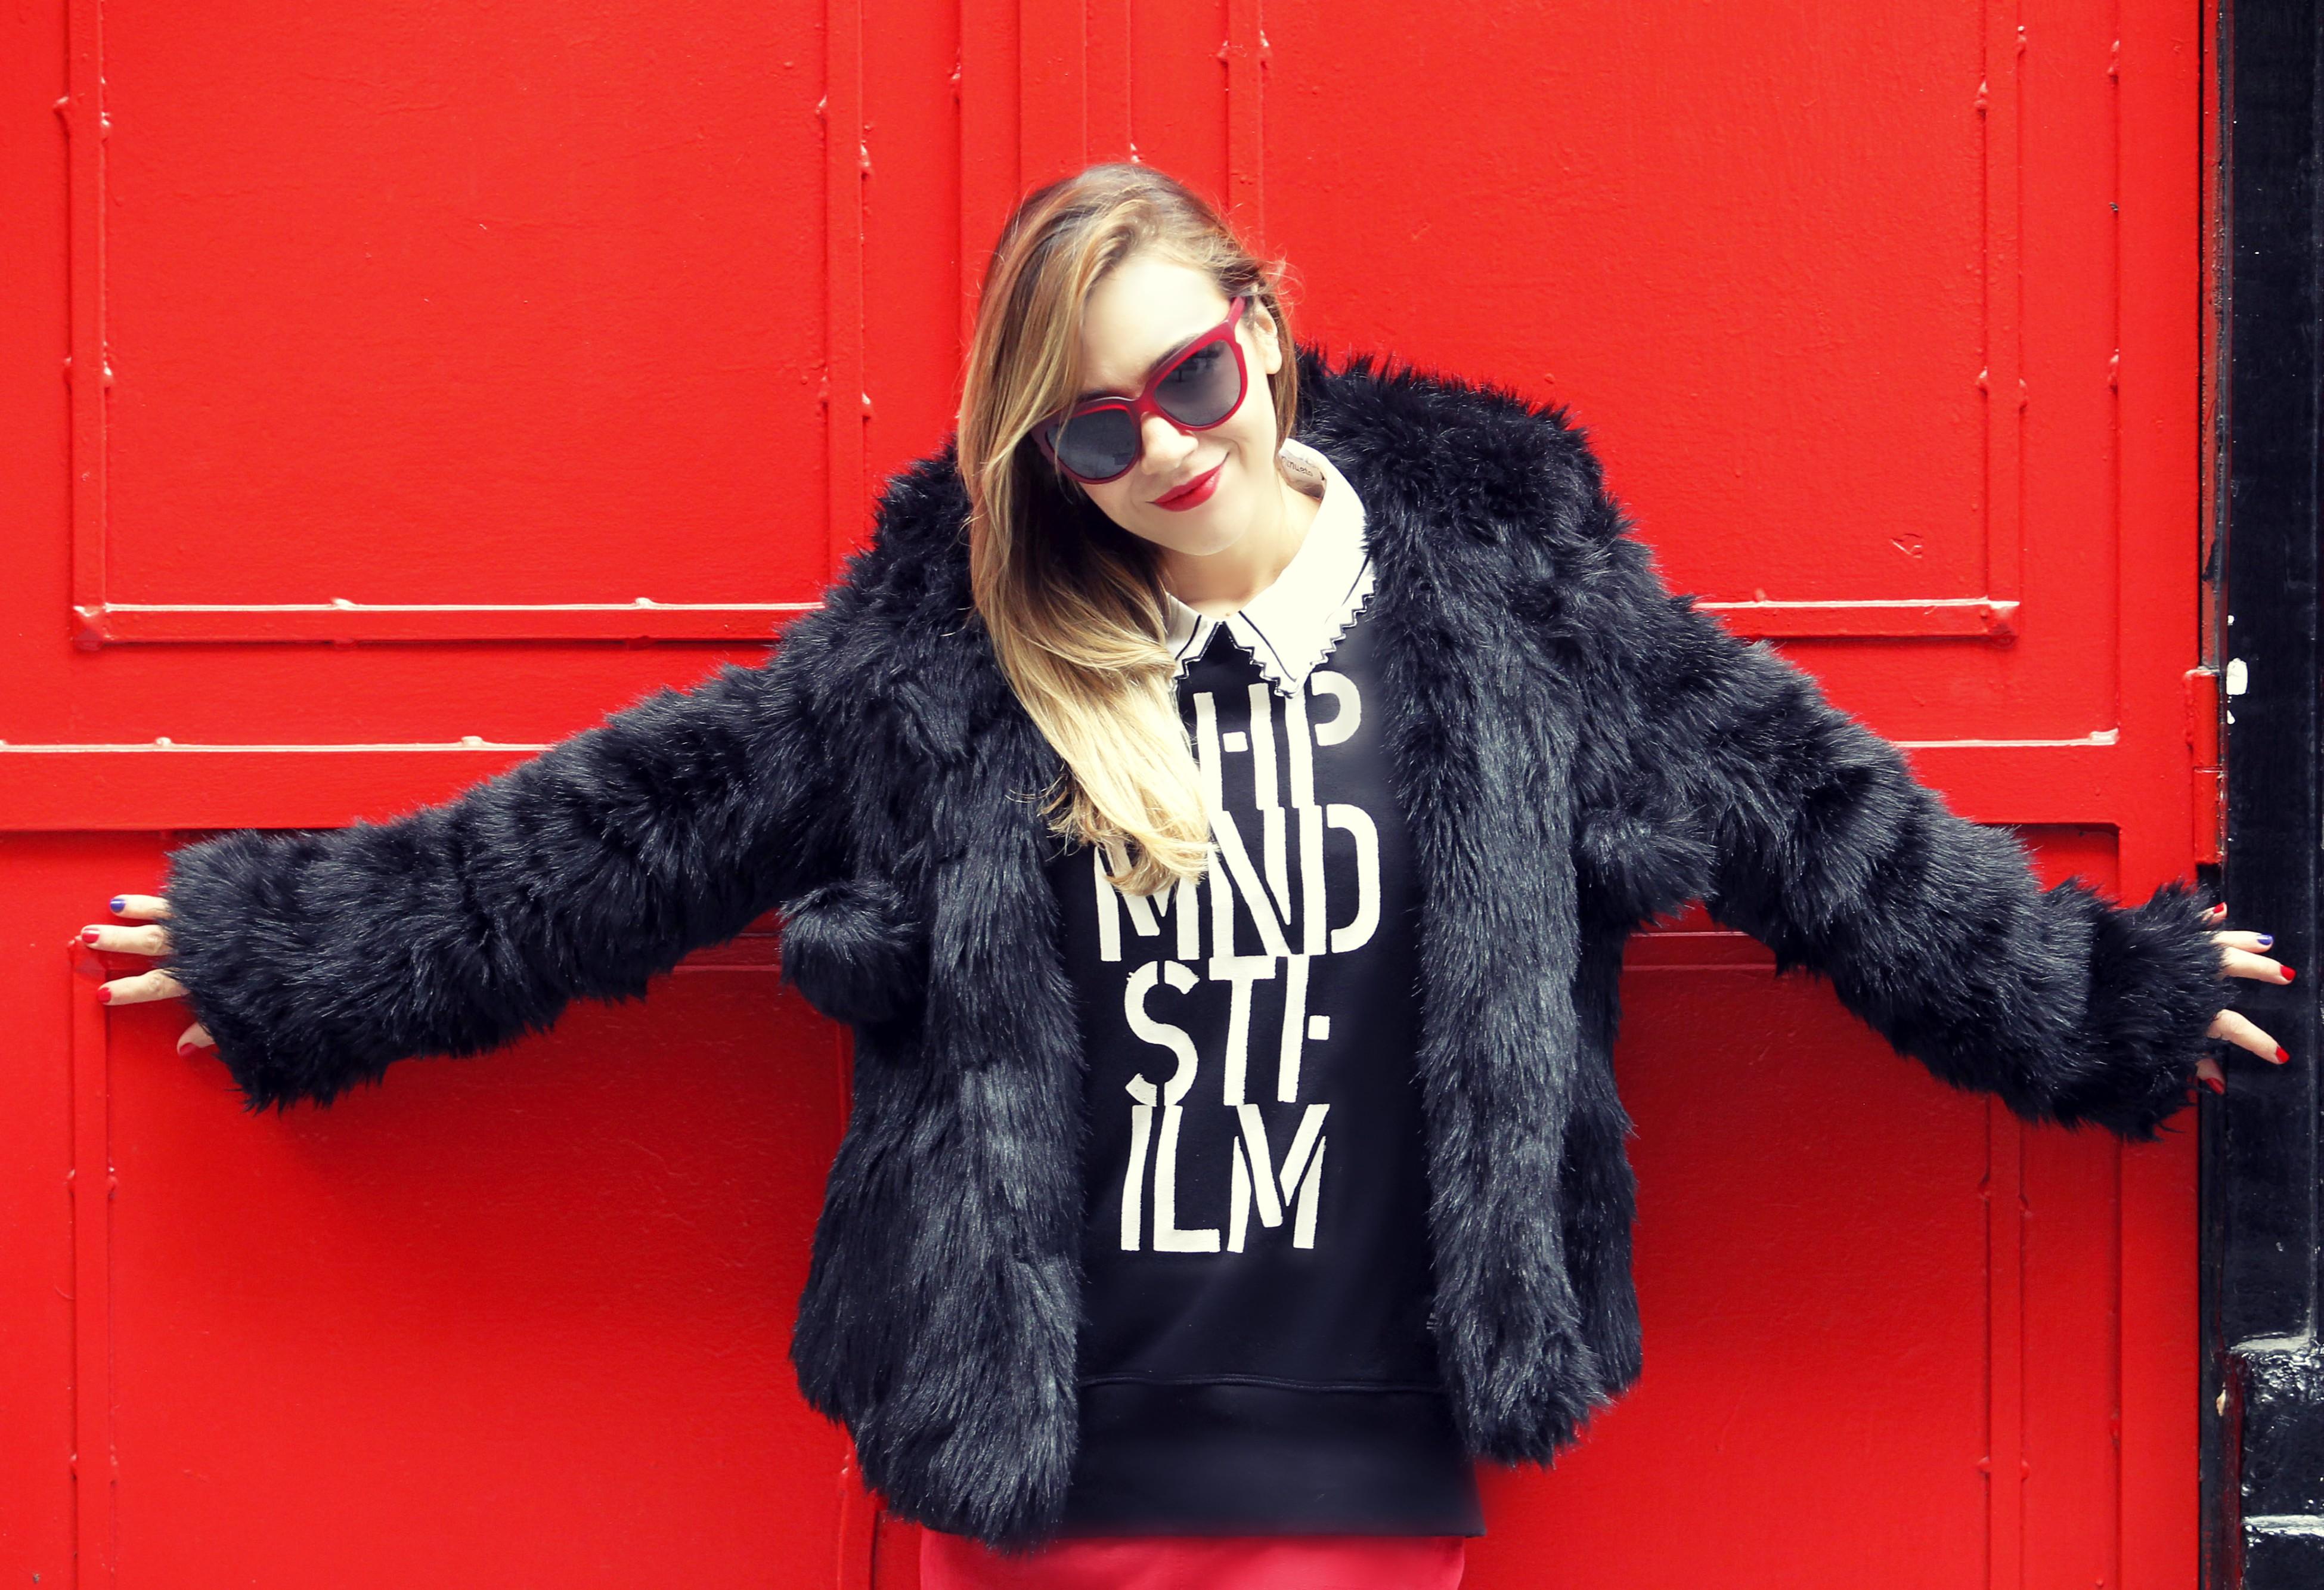 neubau-eyewear-blog-de-moda-ChicAdicta-fashionista-gafas-rojas-Chic-Adicta-Madrid-street-style-abrigo-de-pelo-Asos-PienaenChic-Piensa-en-Chic